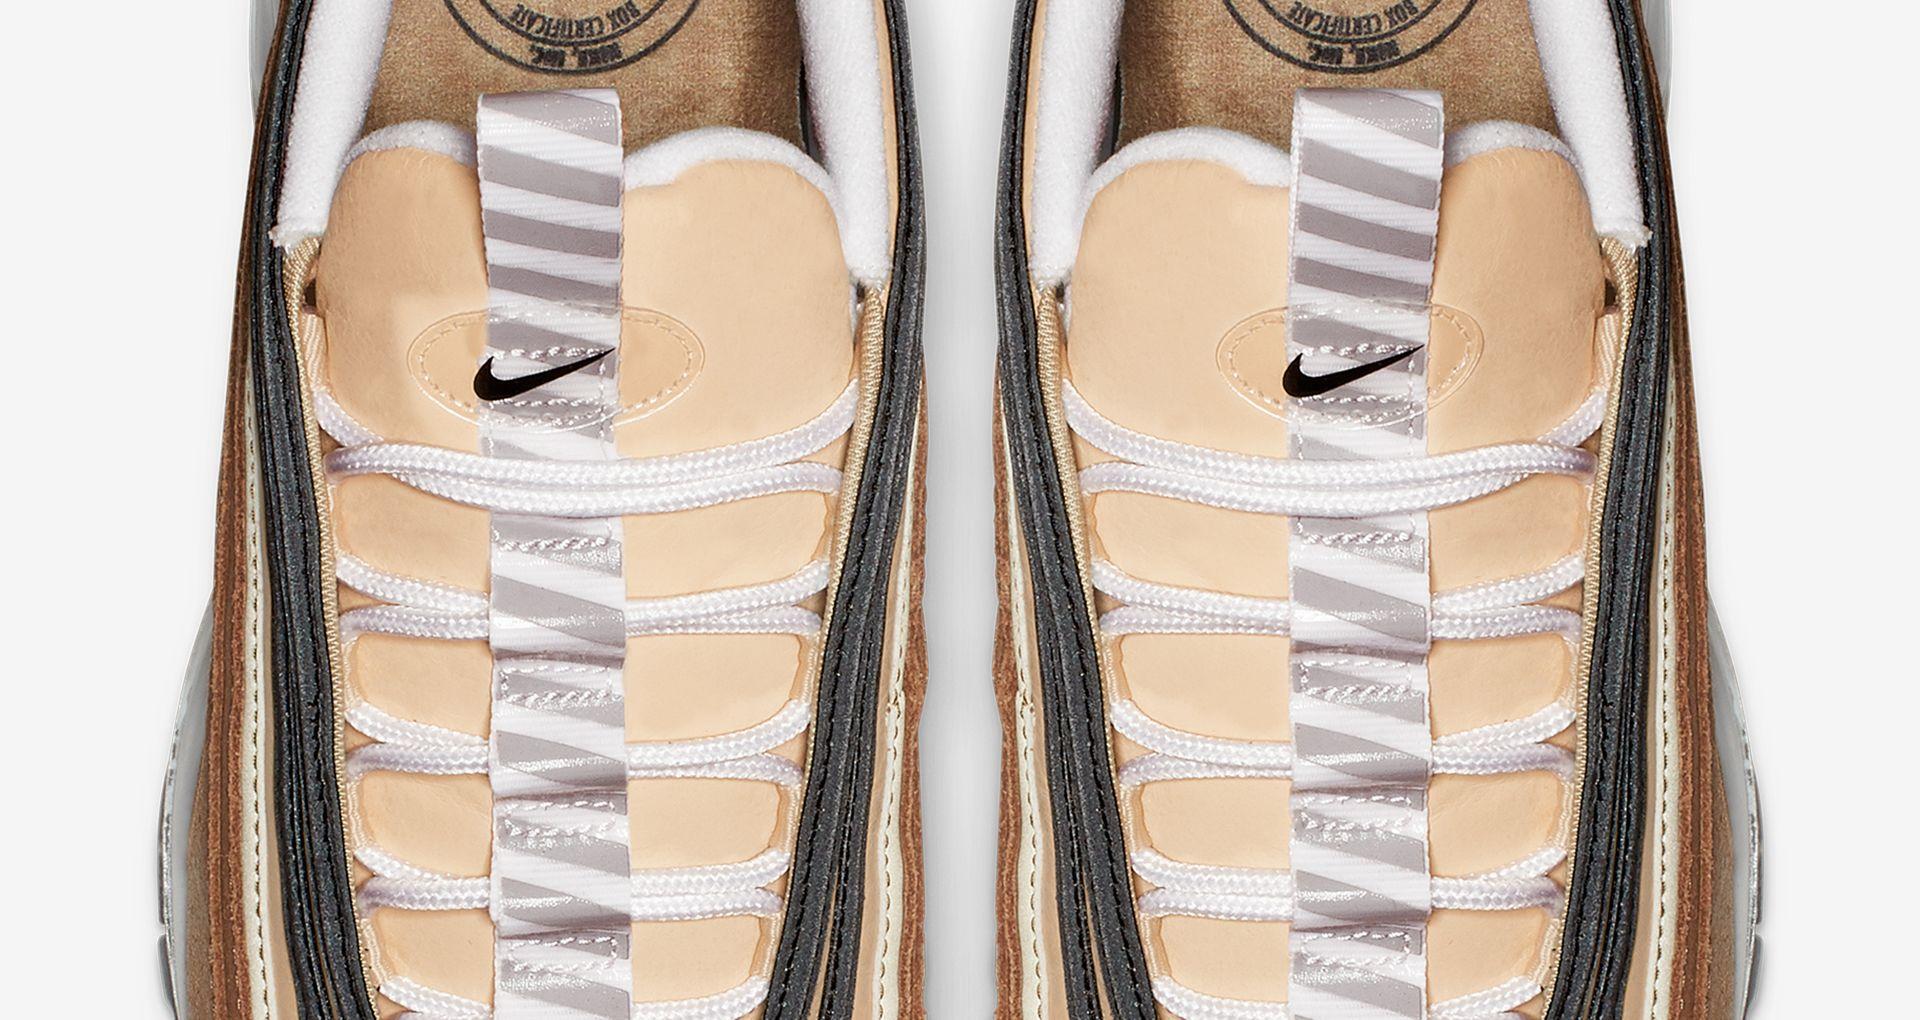 'ale Gold' Brownamp; DateNikeSnkrs Release Nike Max Air Elemental 97 8n0POXwk